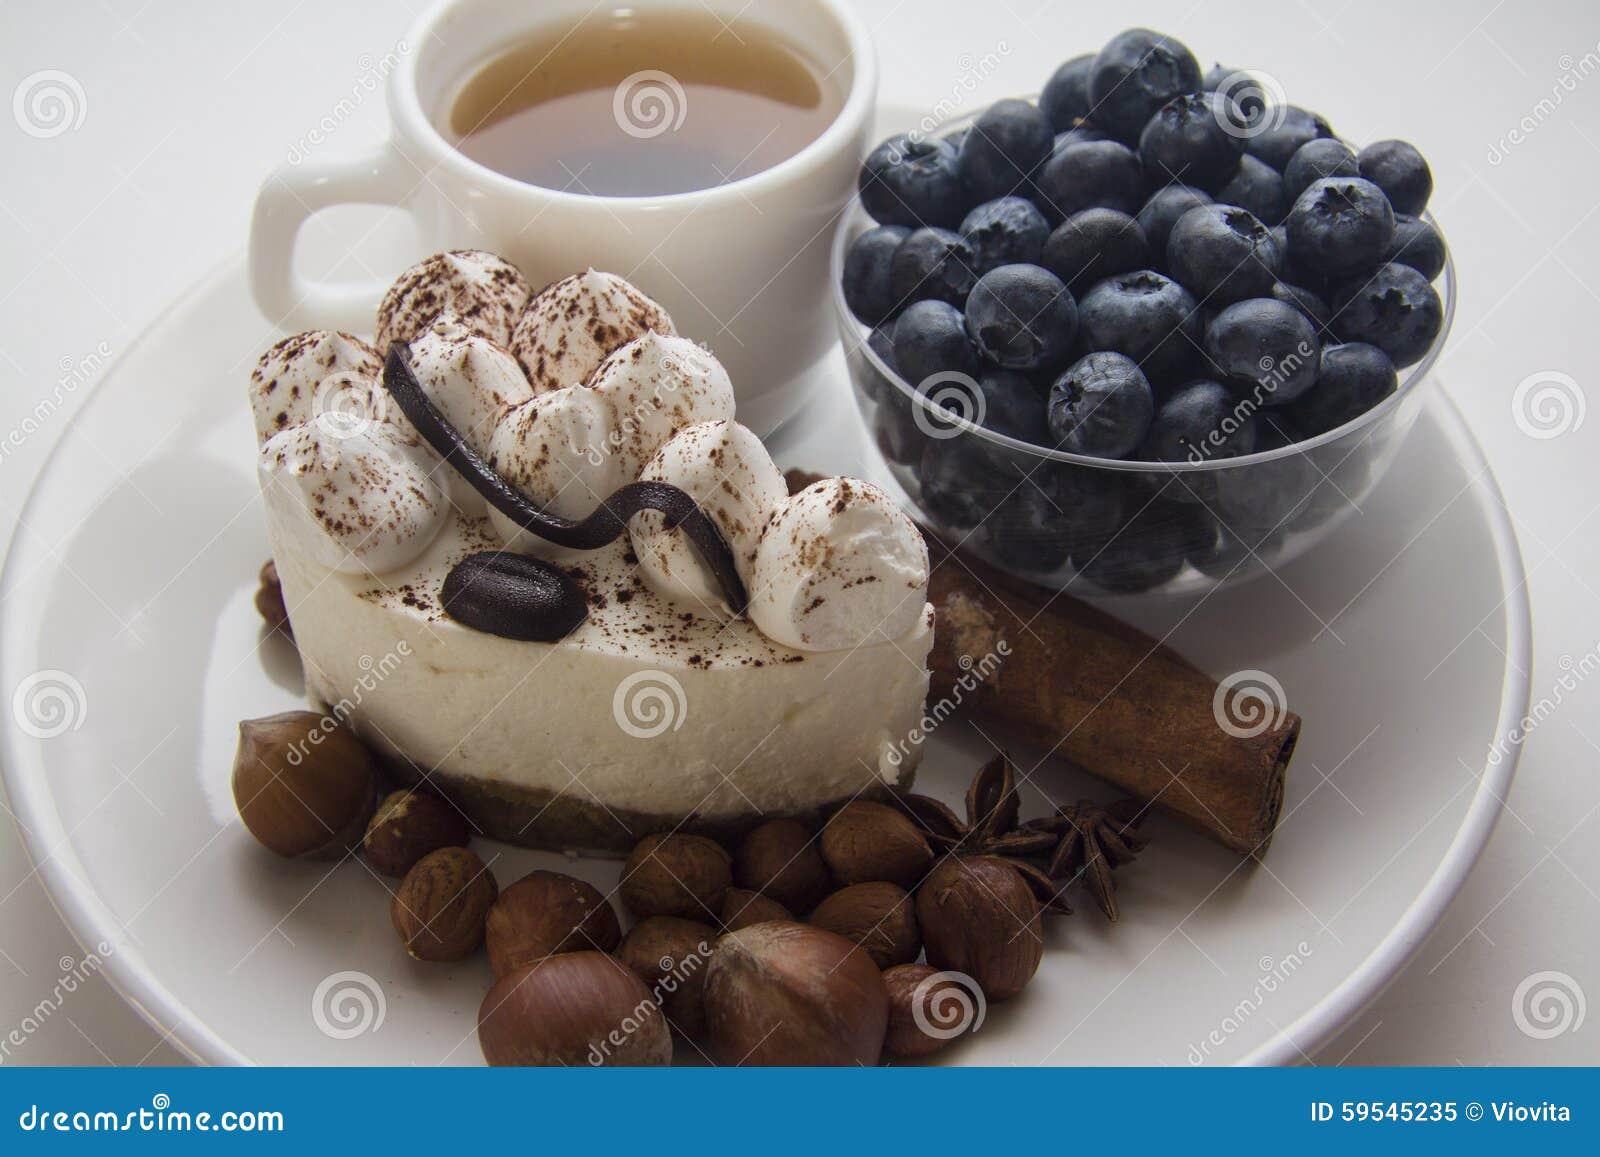 Delicious Italian Tiramisu With Tea And Blueberries Stock